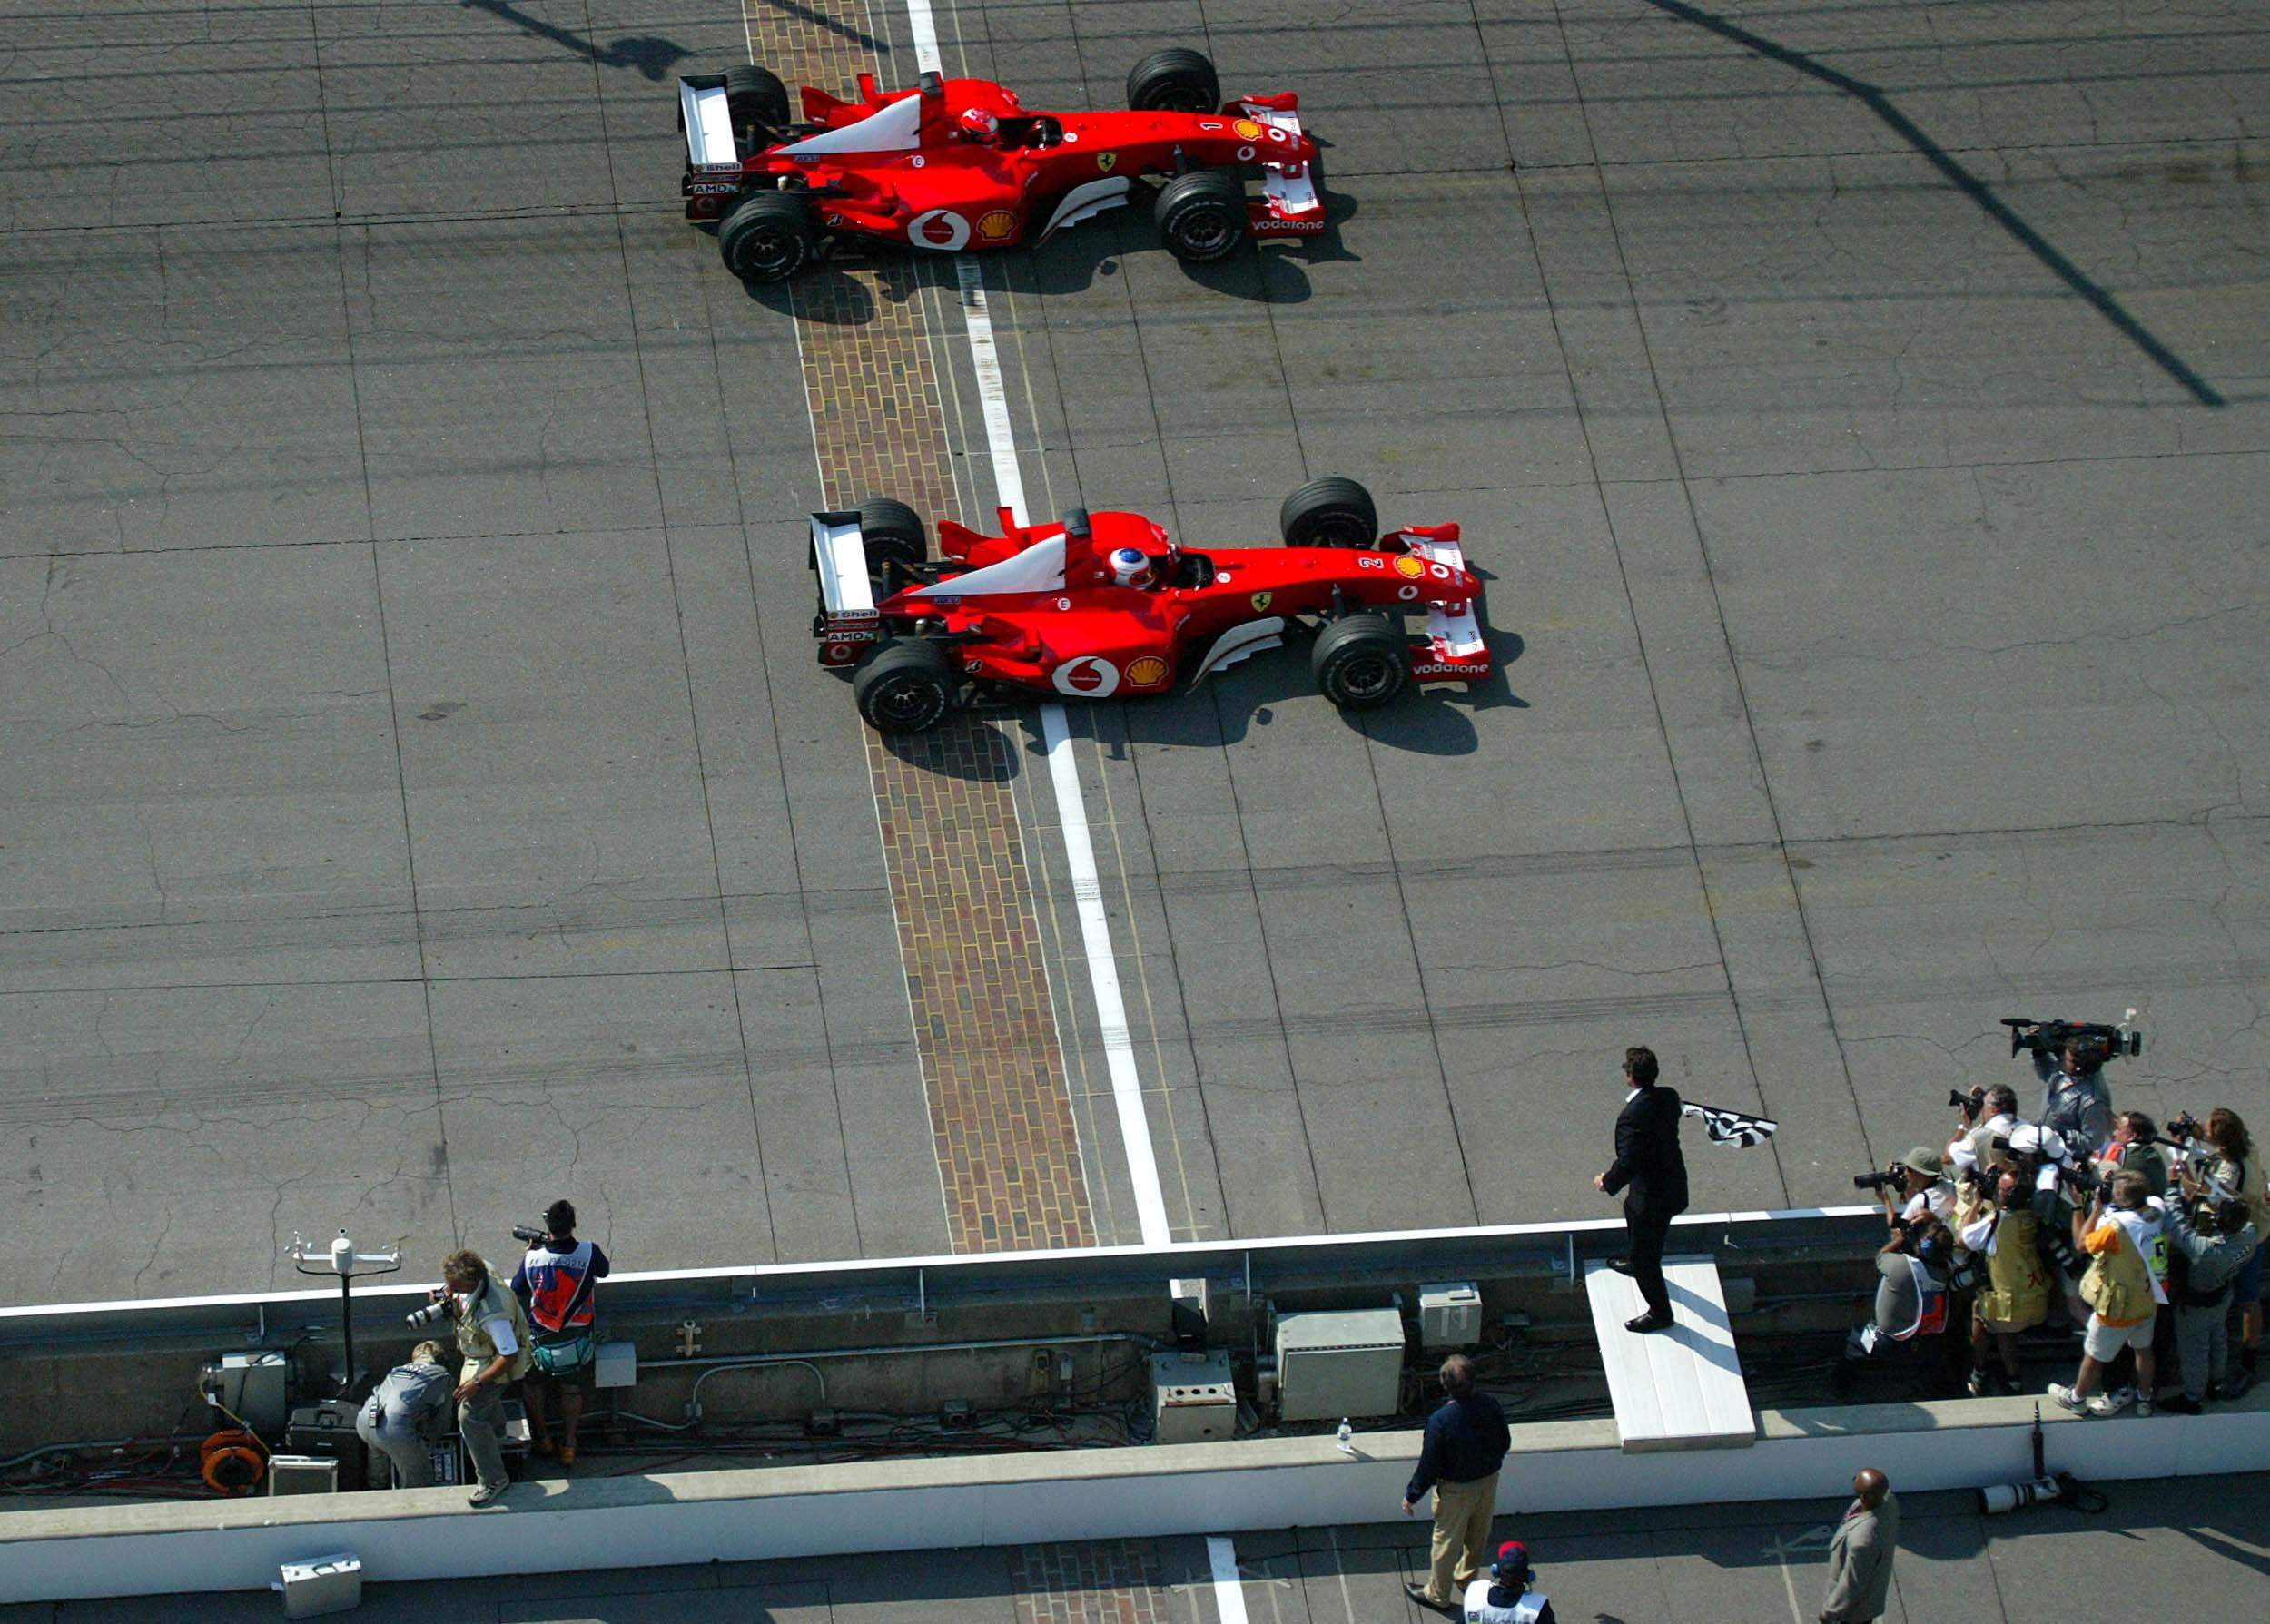 2002 US GP finish Indianapolis F1 Michael Schumacher Rubens Barrichello Ferrari